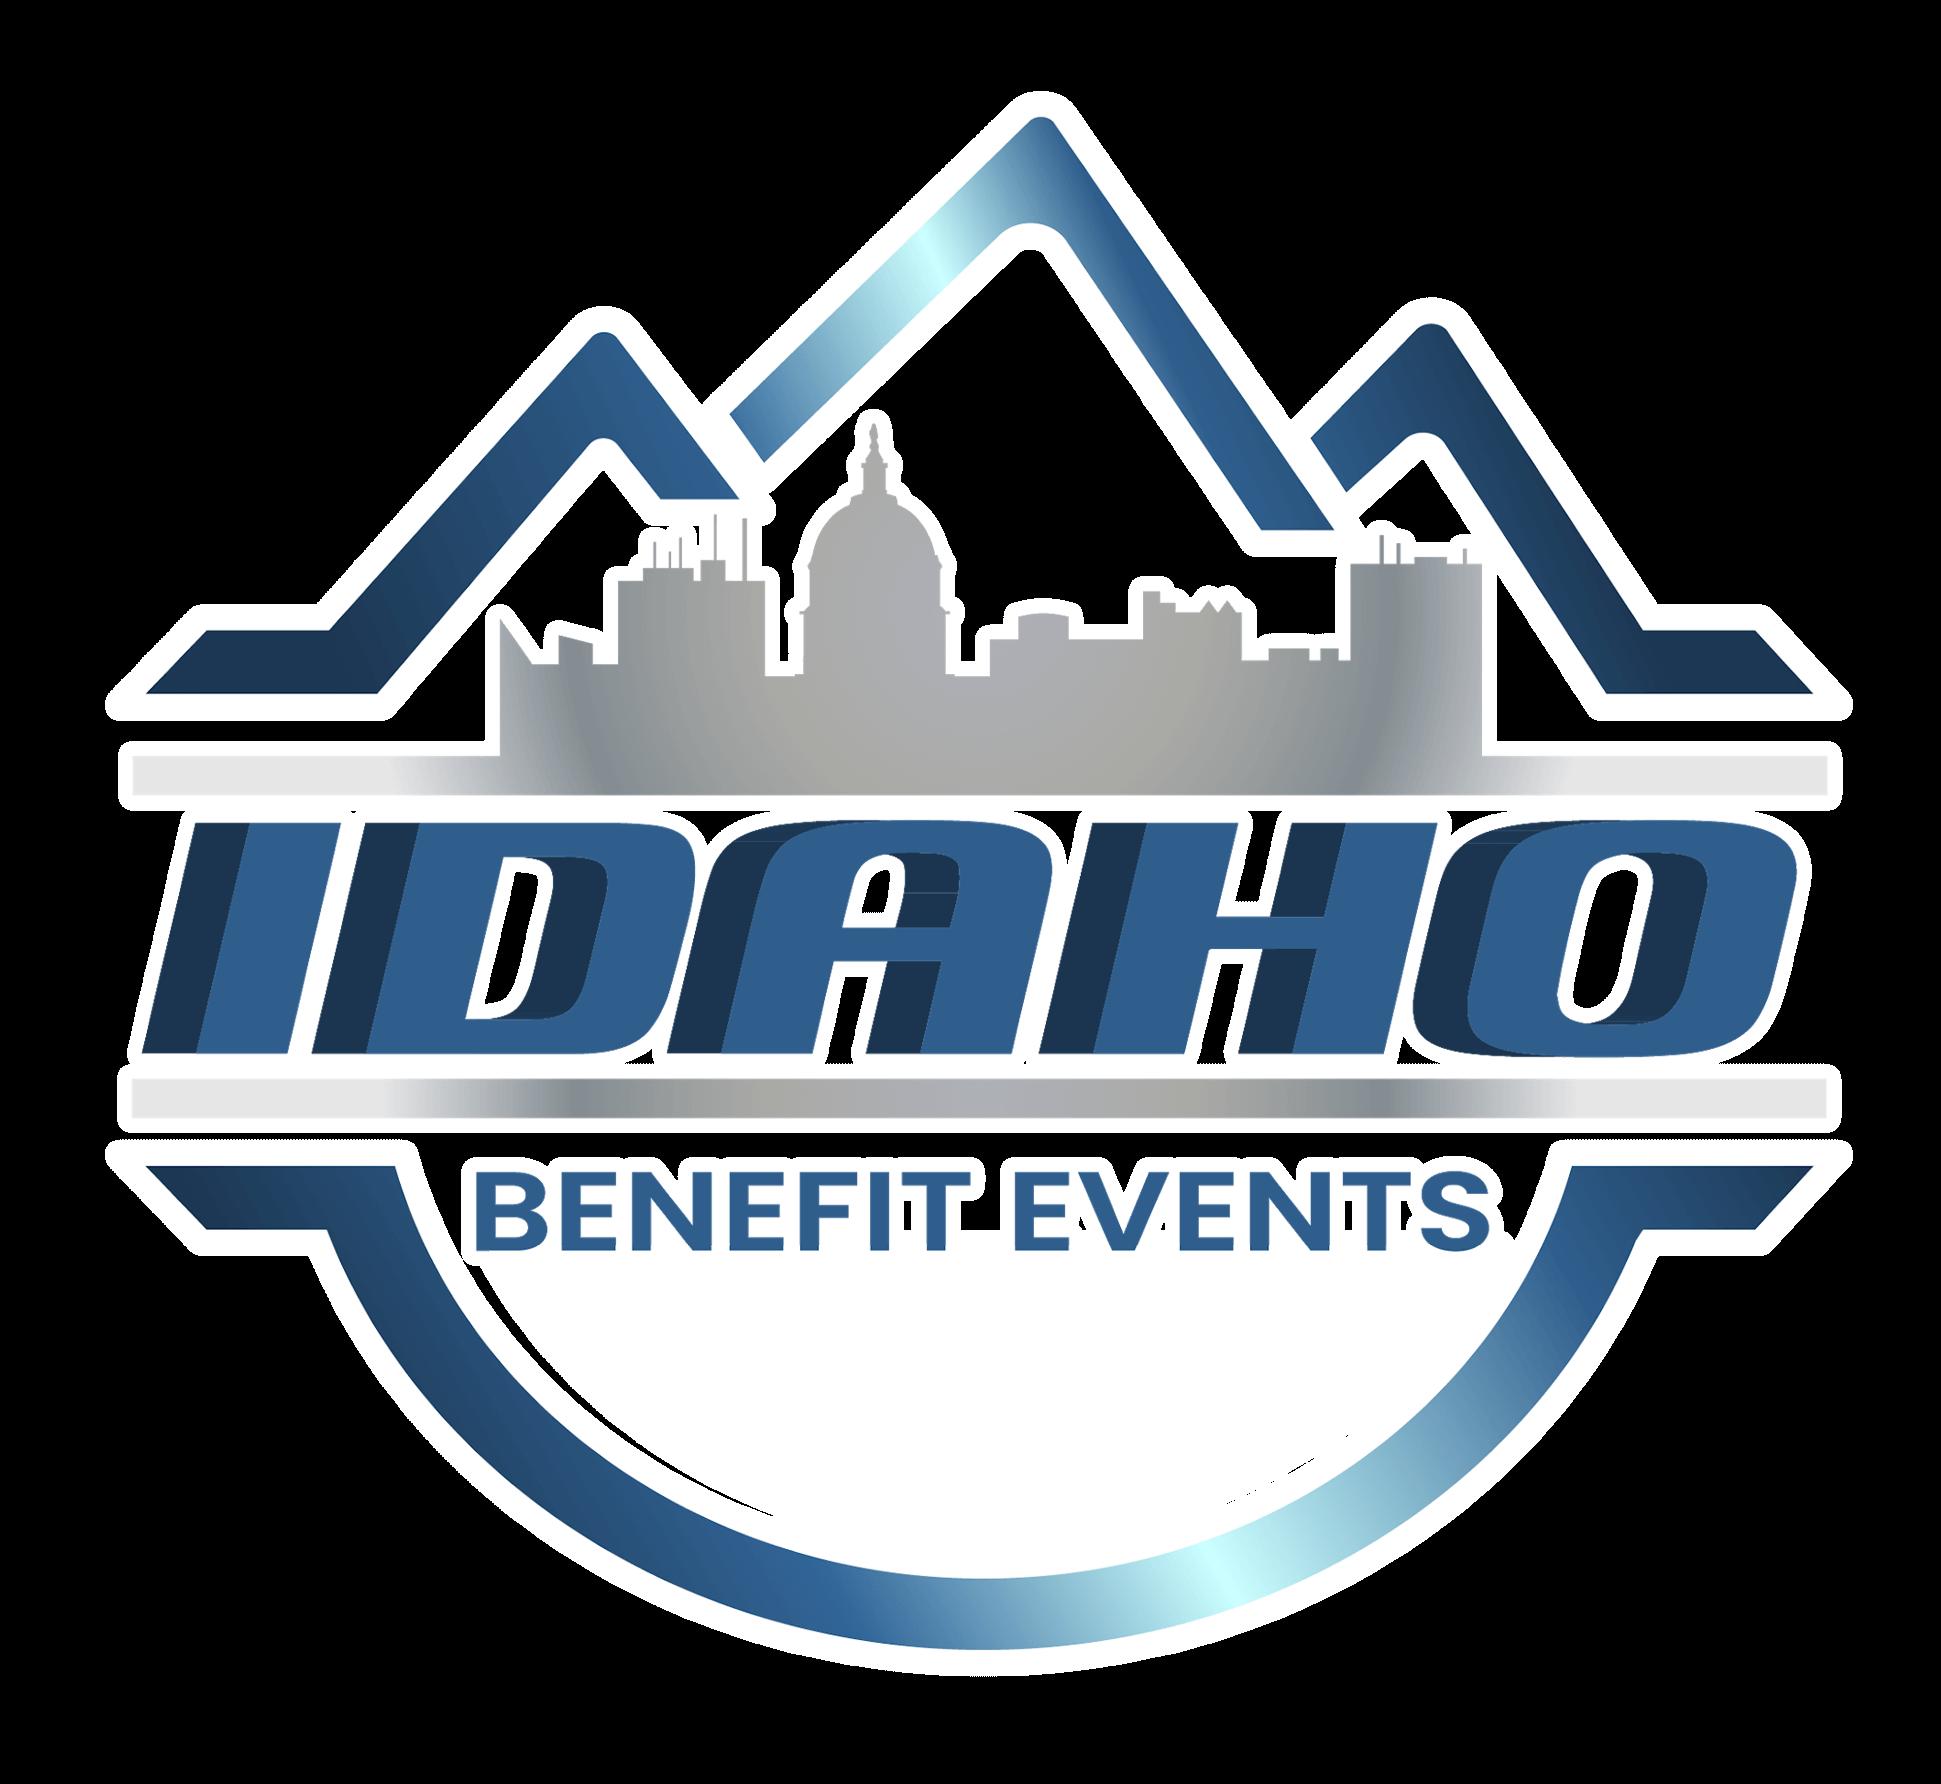 Idaho Benefit Events